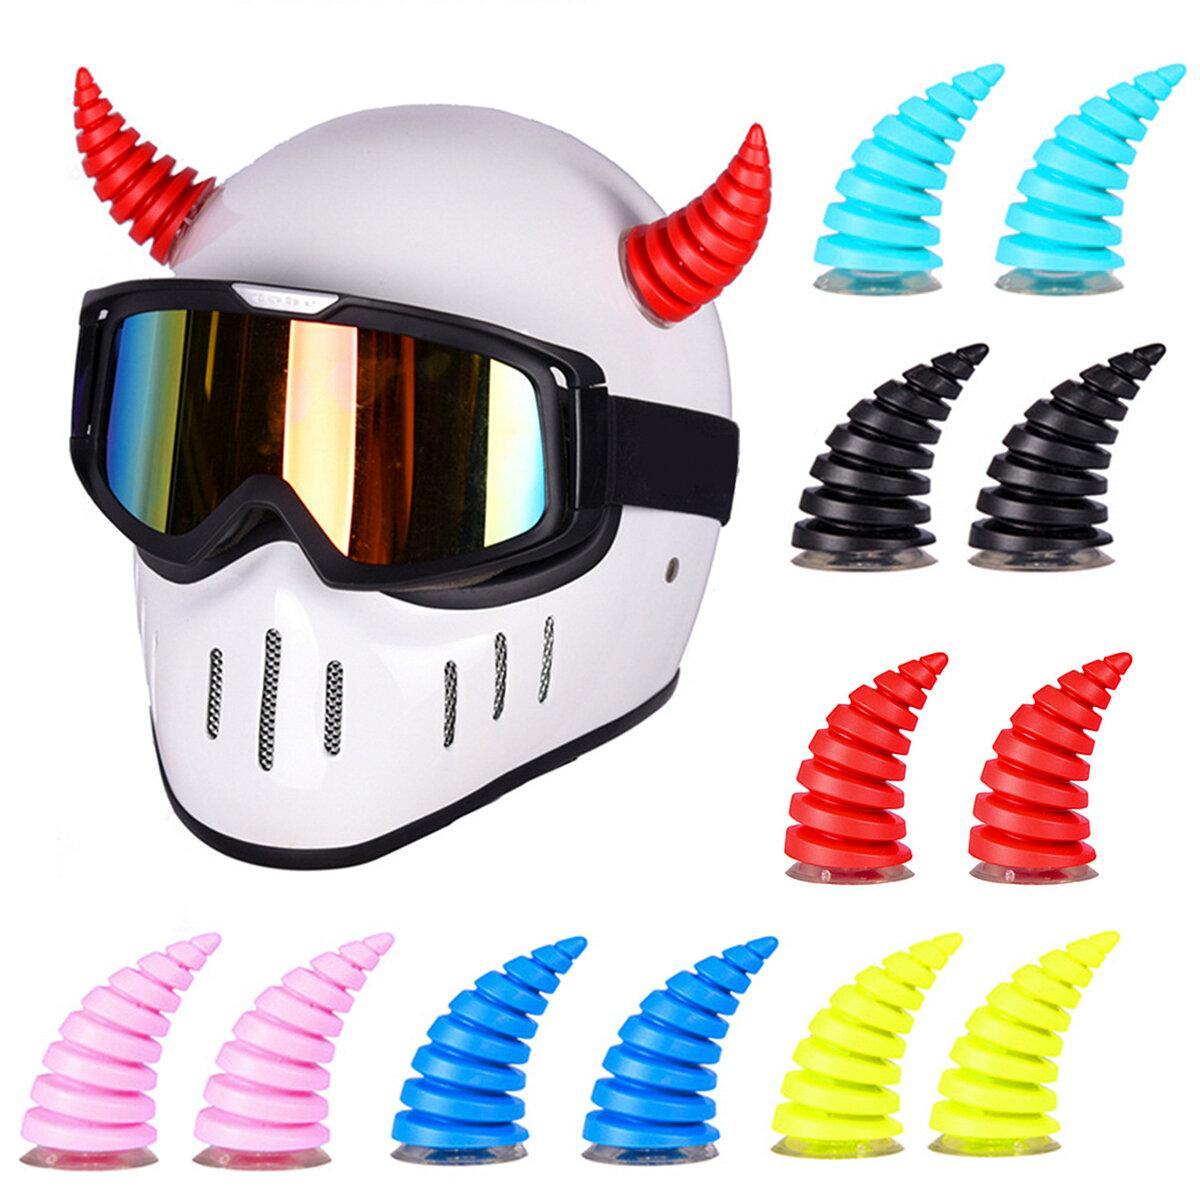 2 uds bicicleta MTB Moto casco con forma de cuerno pegatina ventosa Motocross todoterreno casco decoración fiesta Cospla